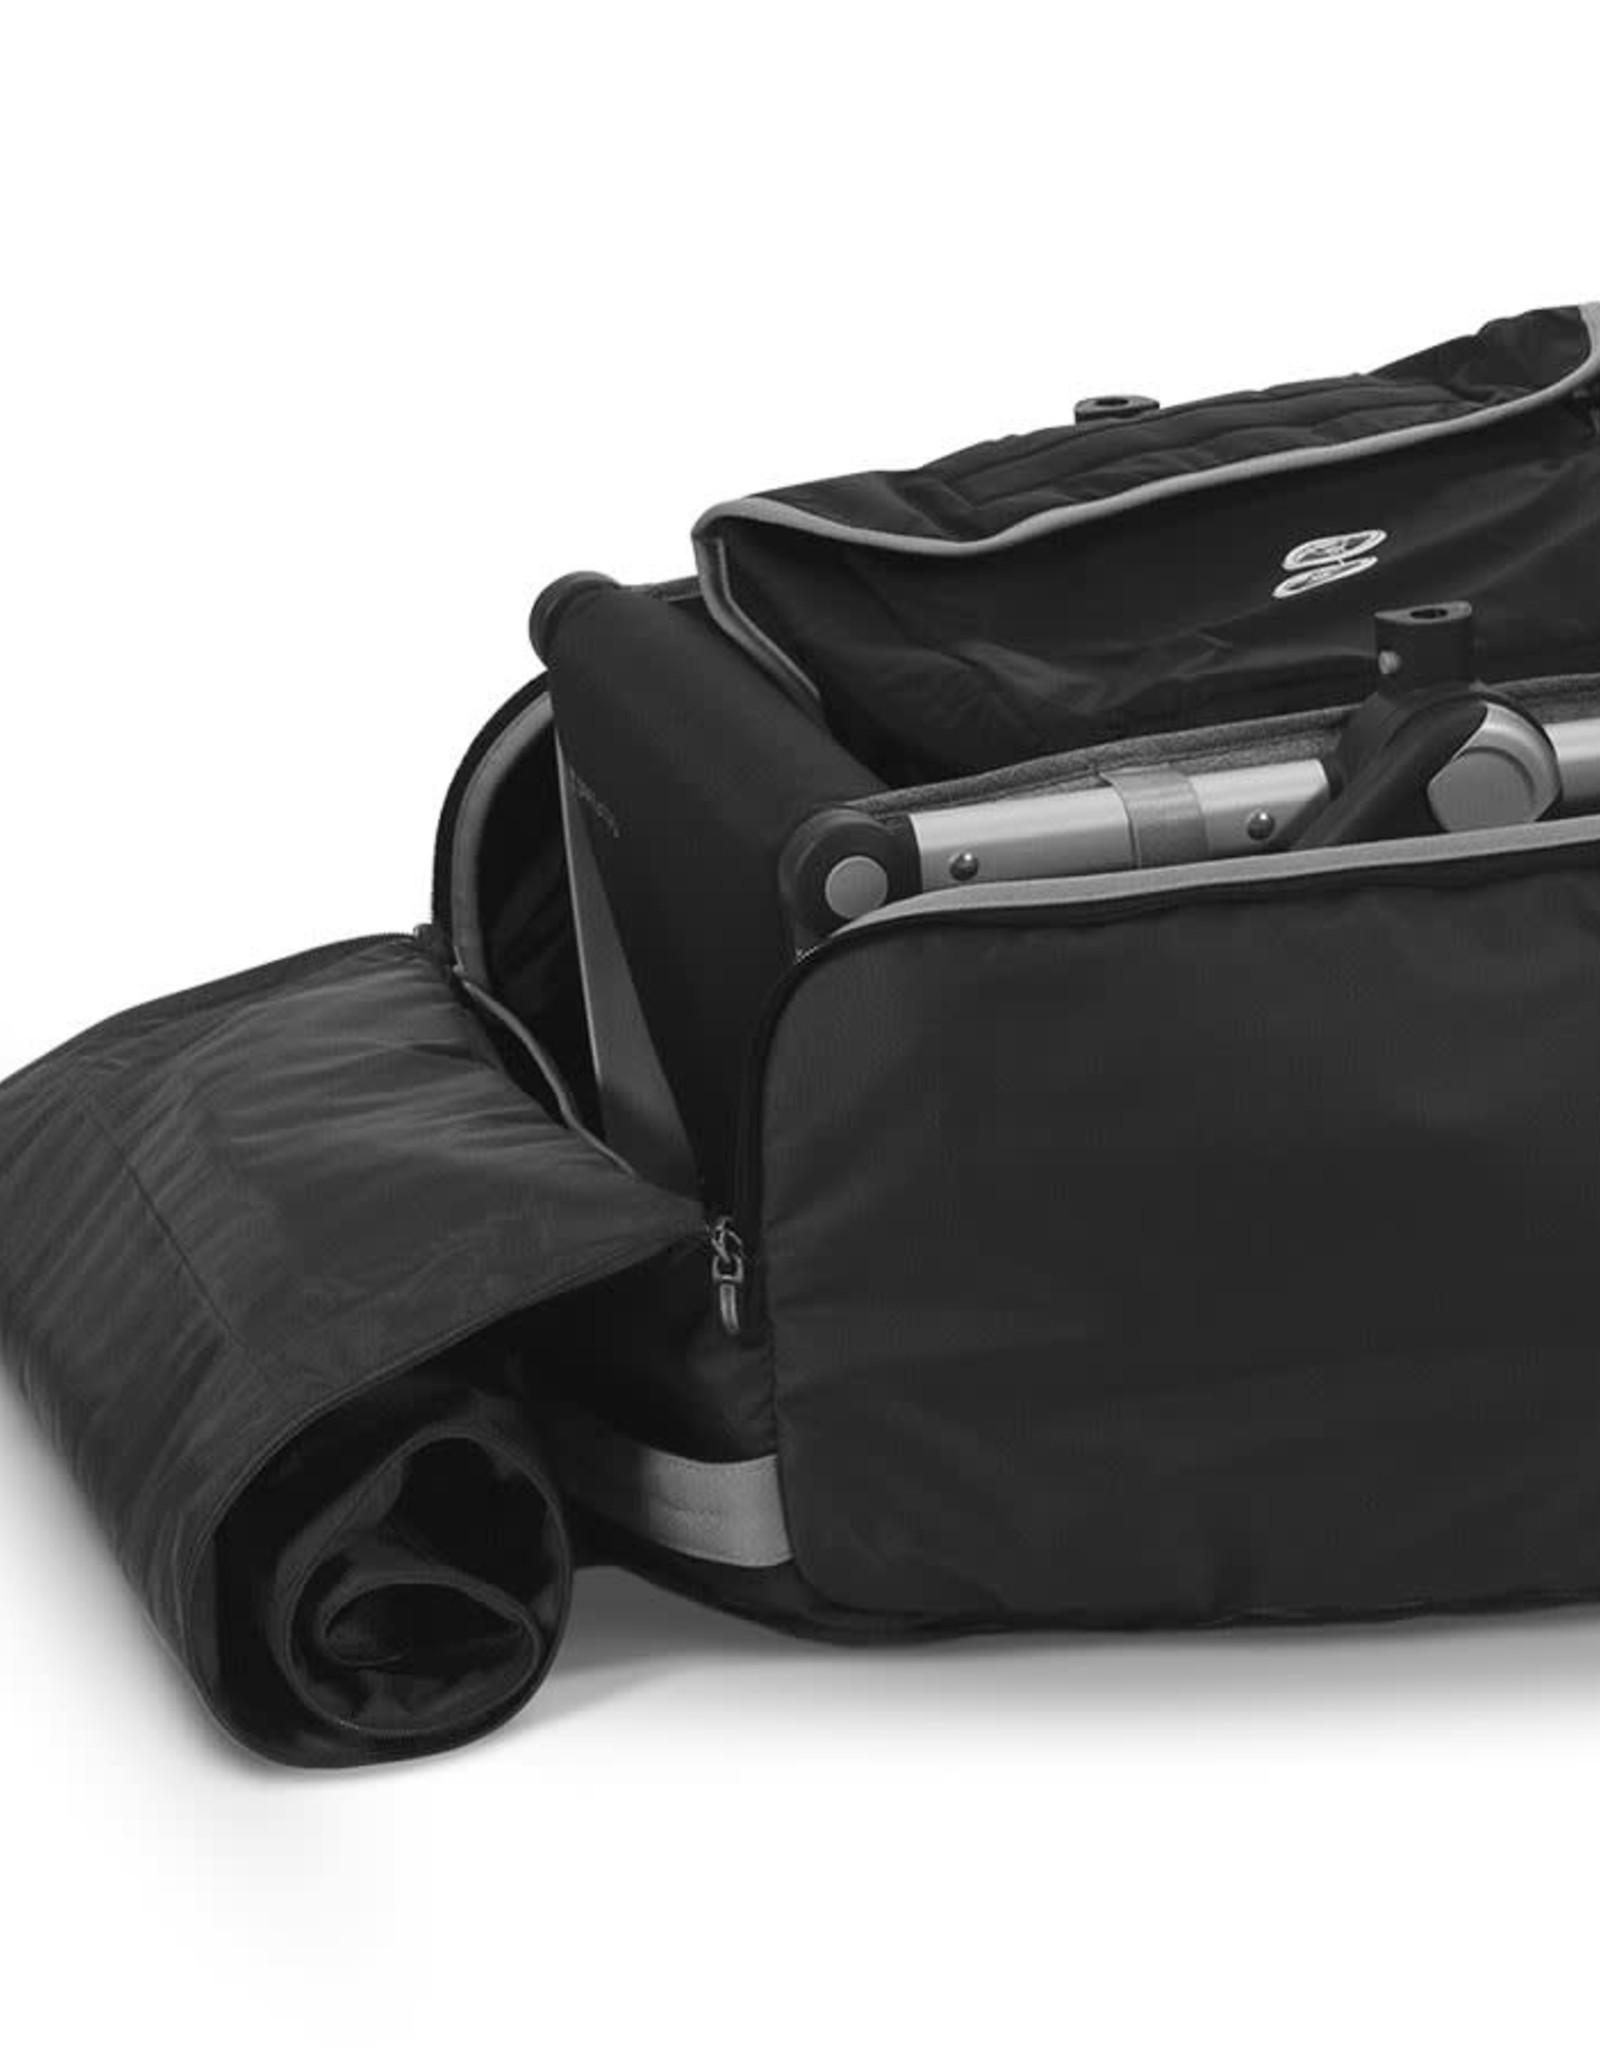 UPPAbaby UPPAbaby - Travel Bag for Vista, Vista V2, Cruz and Cruz V2